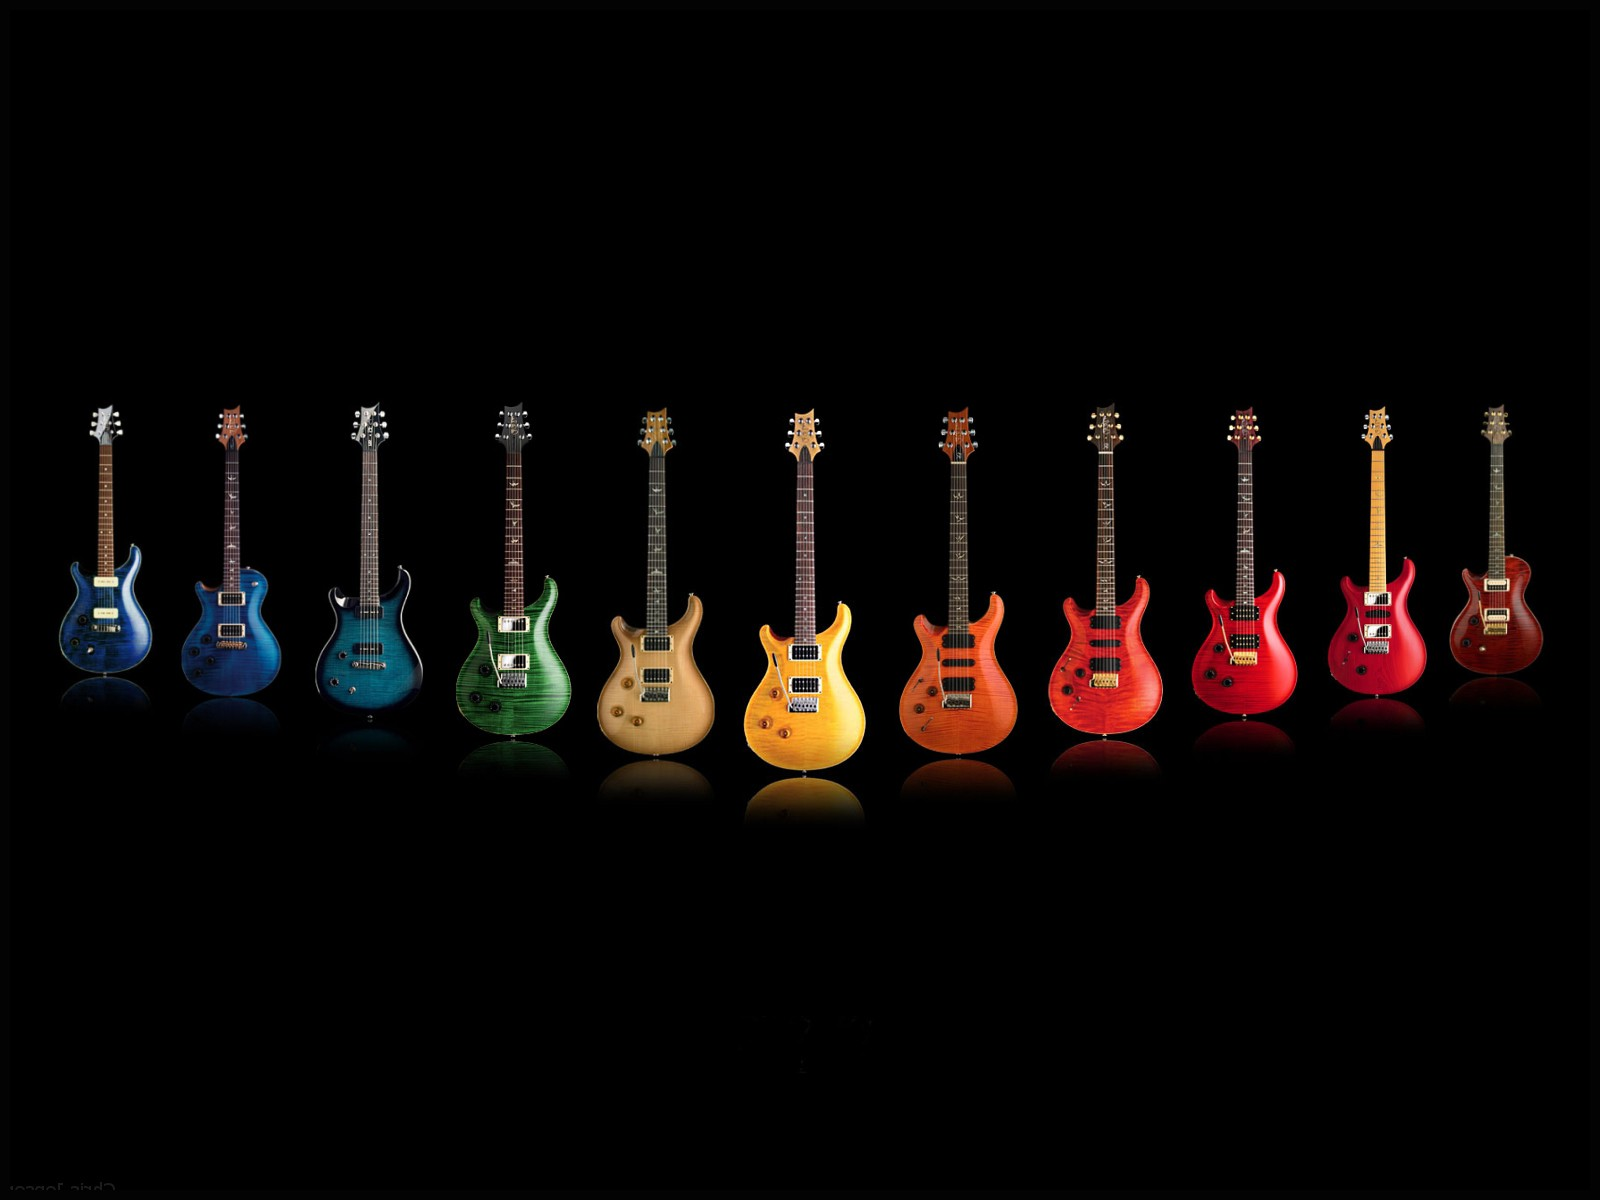 Awesome Music desktop Backgrounds | Rocks wallpaper hd